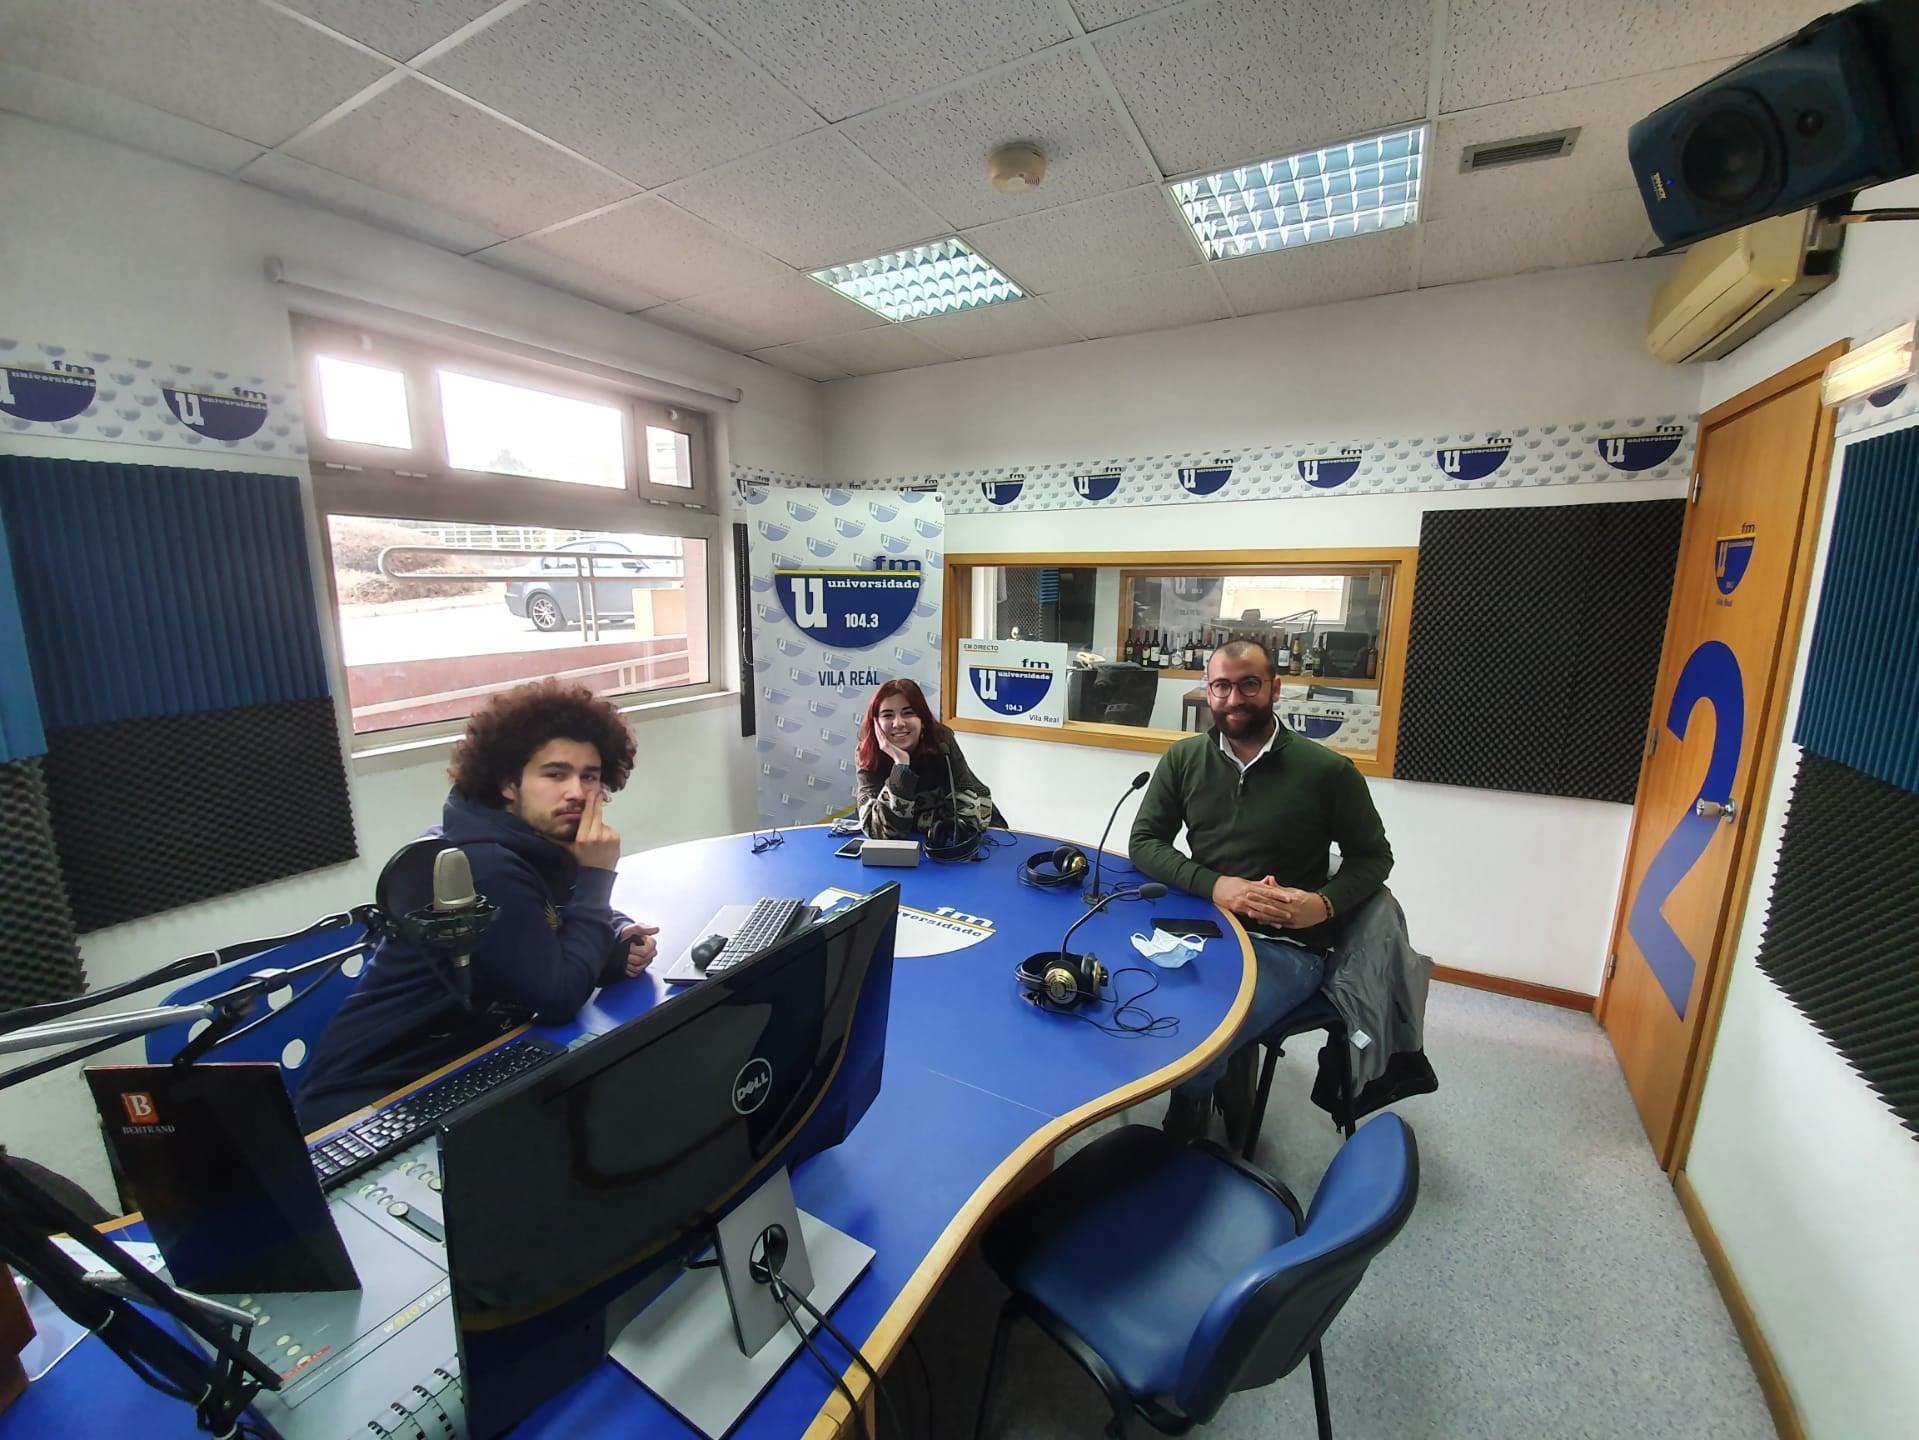 NECCTAR Entrevista - Universidade FM